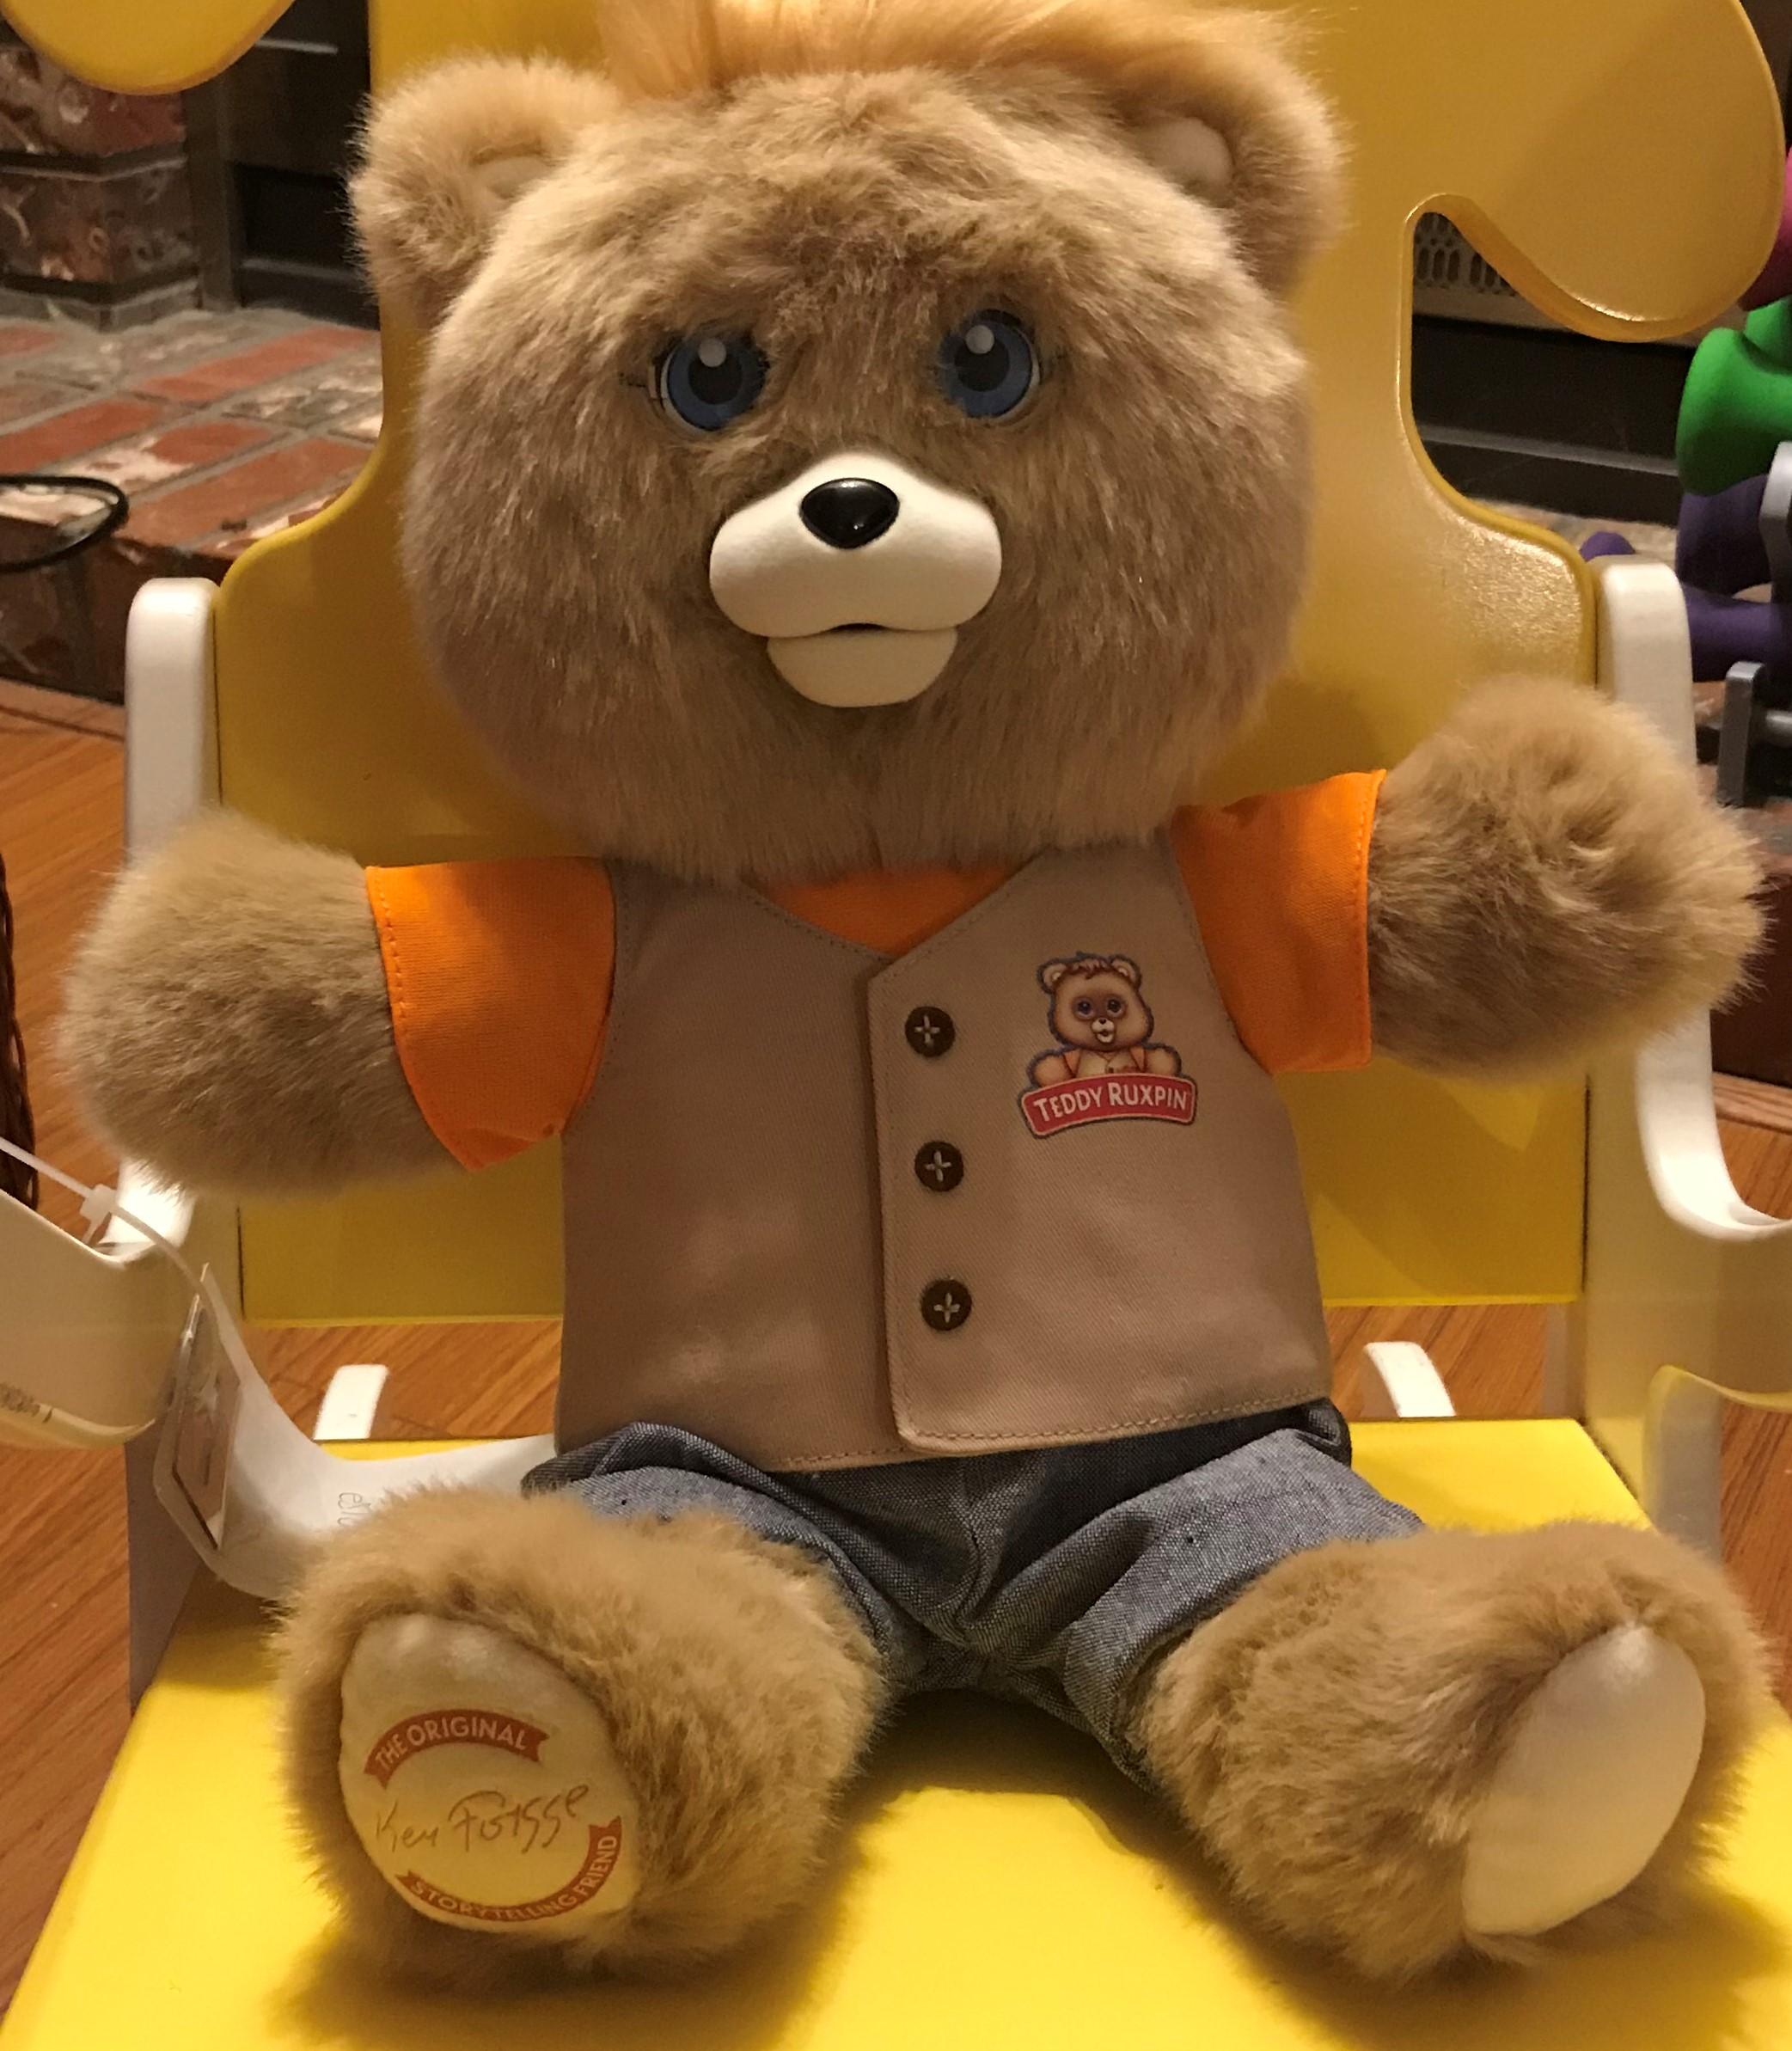 Teddy Ruxpin sitting in a chair